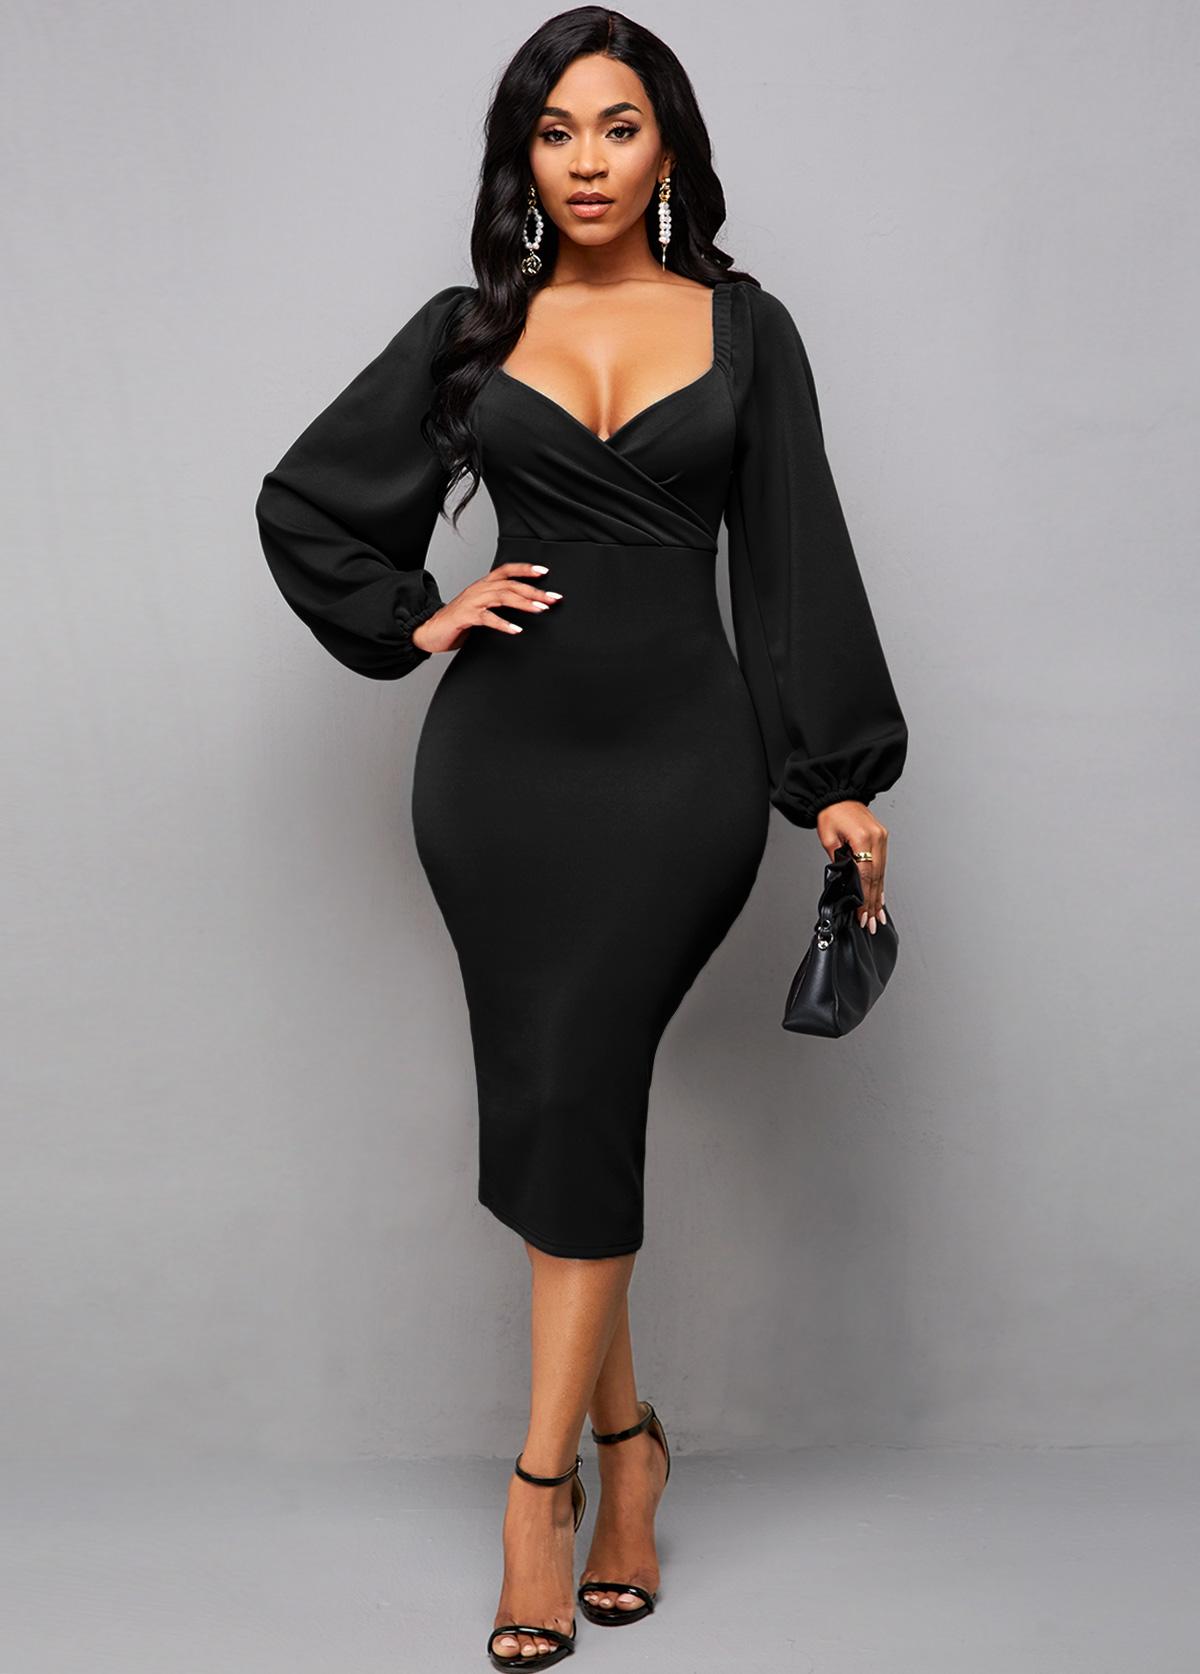 Lantern Sleeve Back Slit Black Bodycon Dress